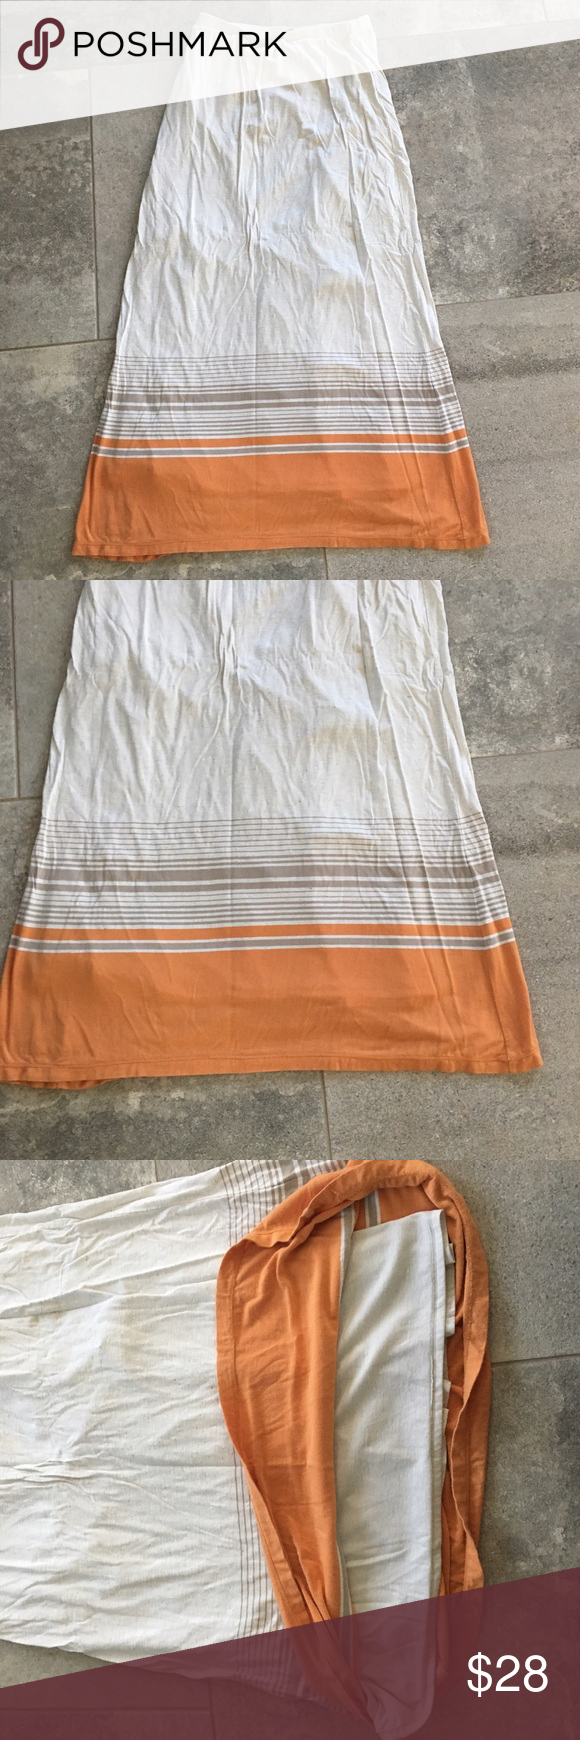 Cream & Orange Striped Maxi Skirt | Maxis, Colors and Maxi skirts